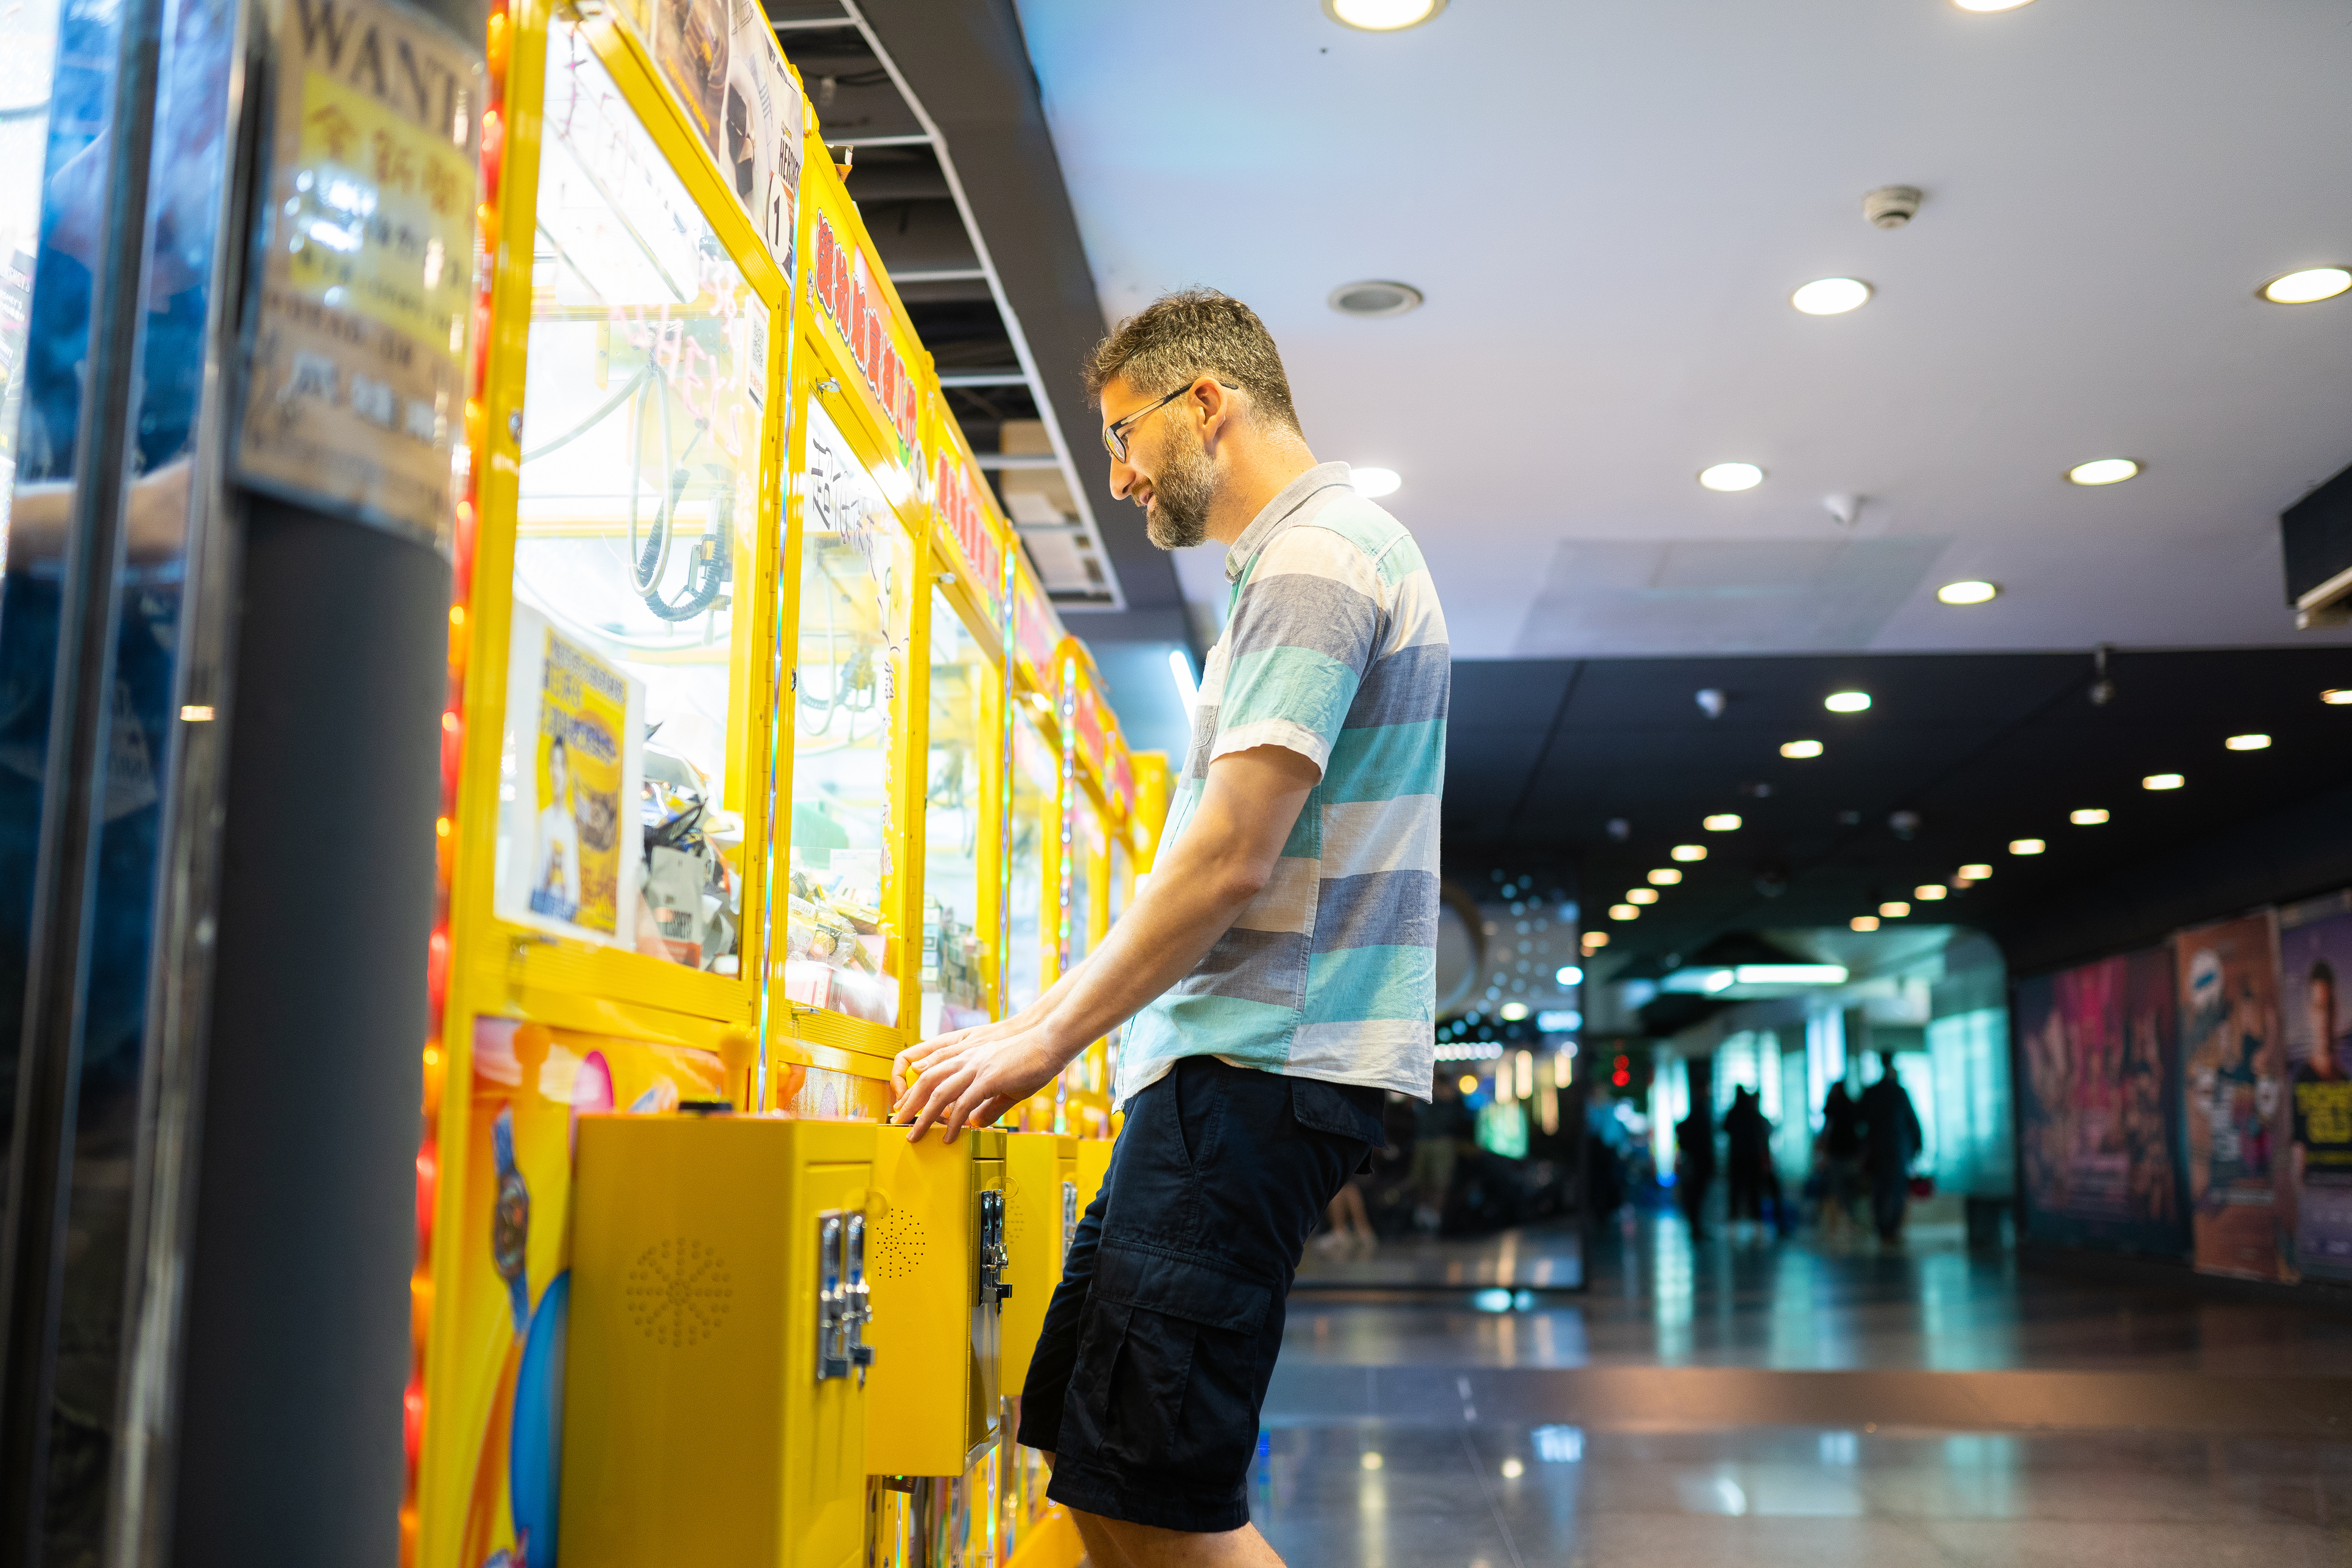 crane game arcade claw prize